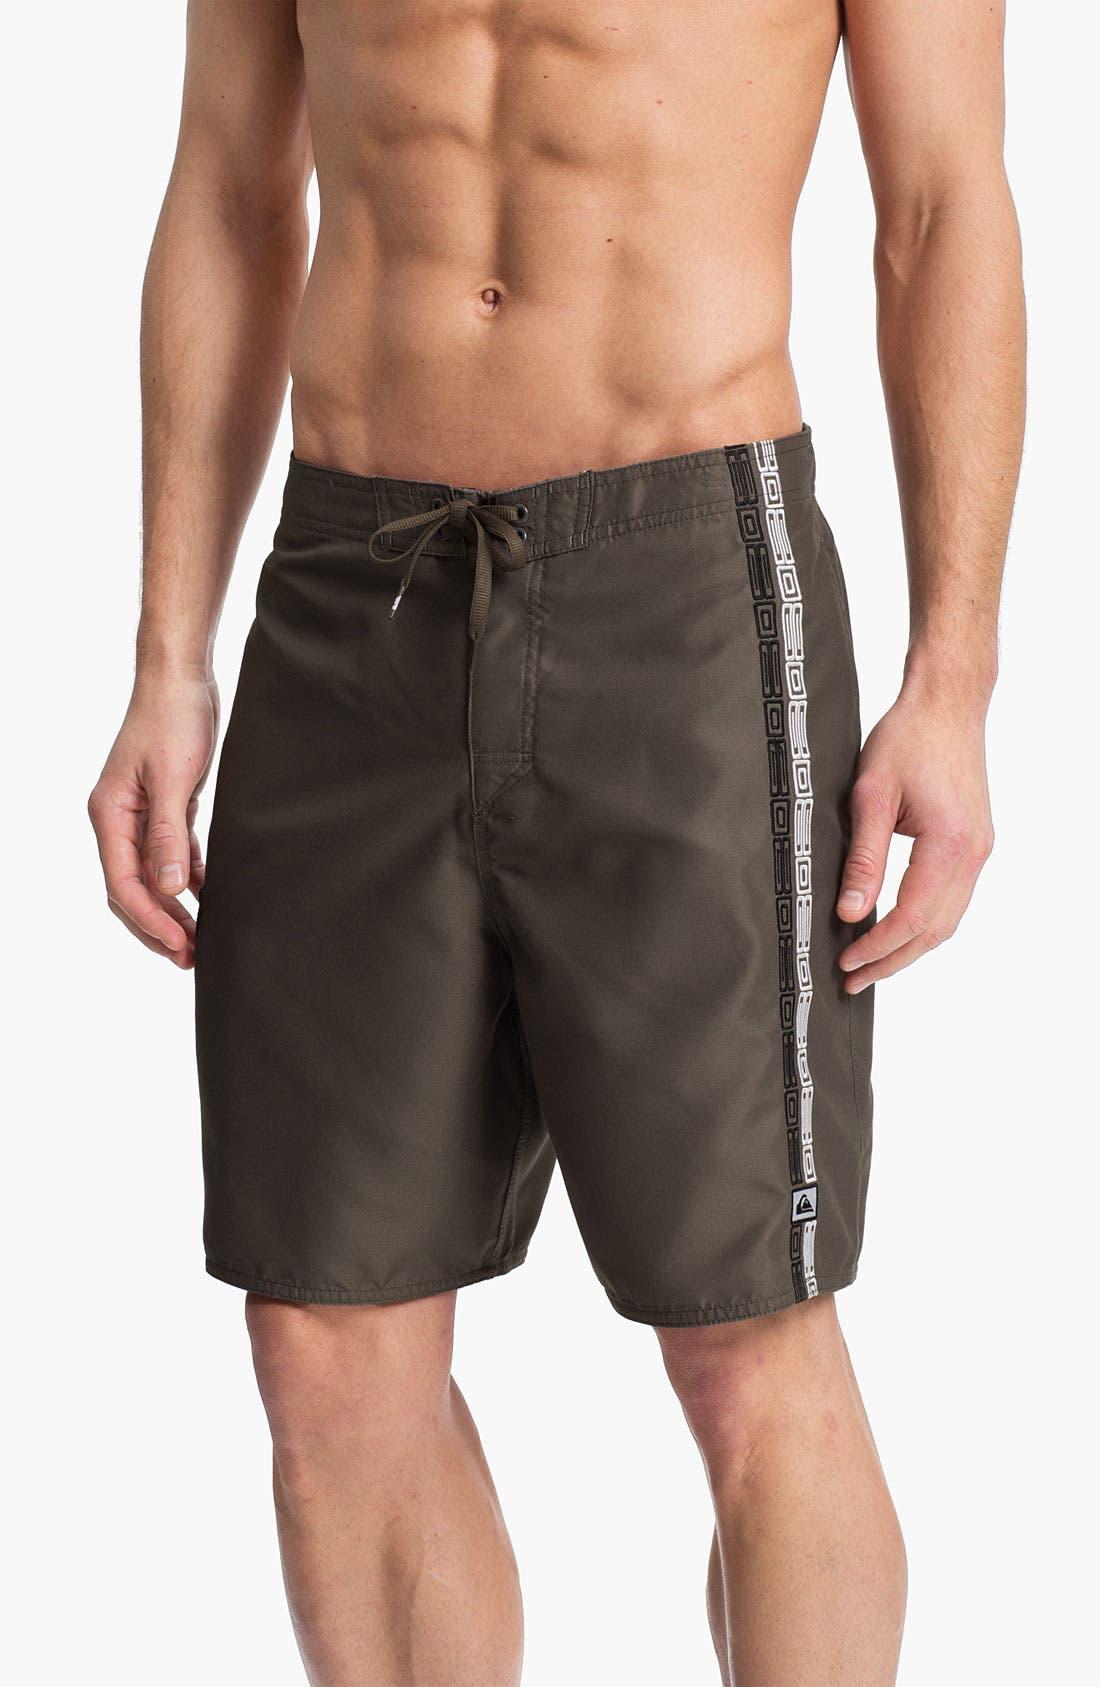 Alternate Image 1 Selected - Quiksilver 'Balboa' Board Shorts